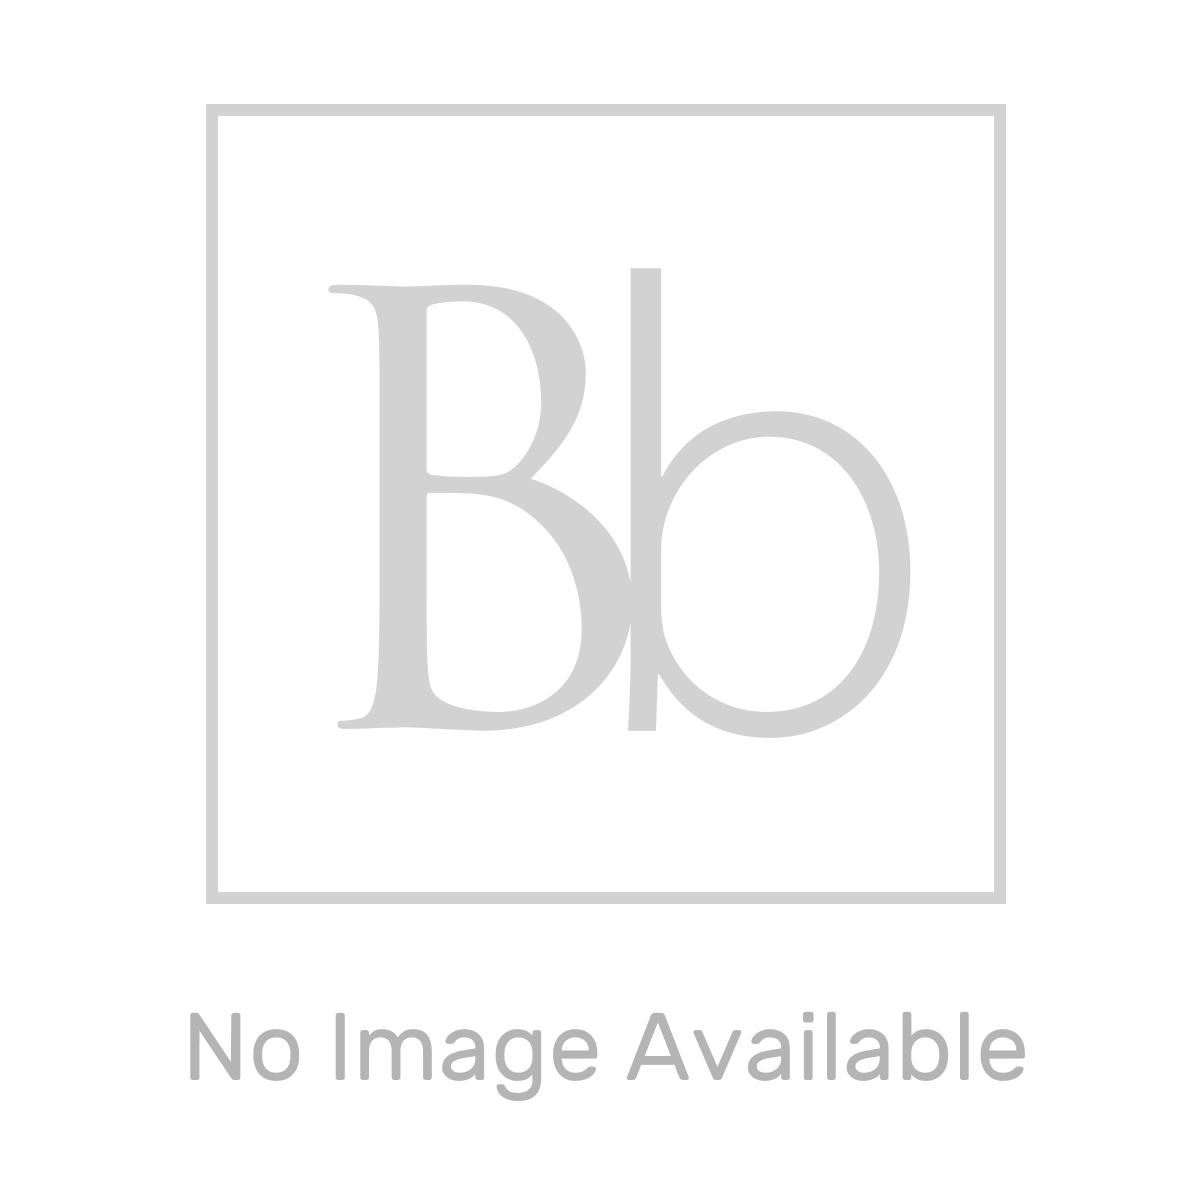 Mito White Gloss Wall Hung Vanity Unit 750mm Line Drawing 2